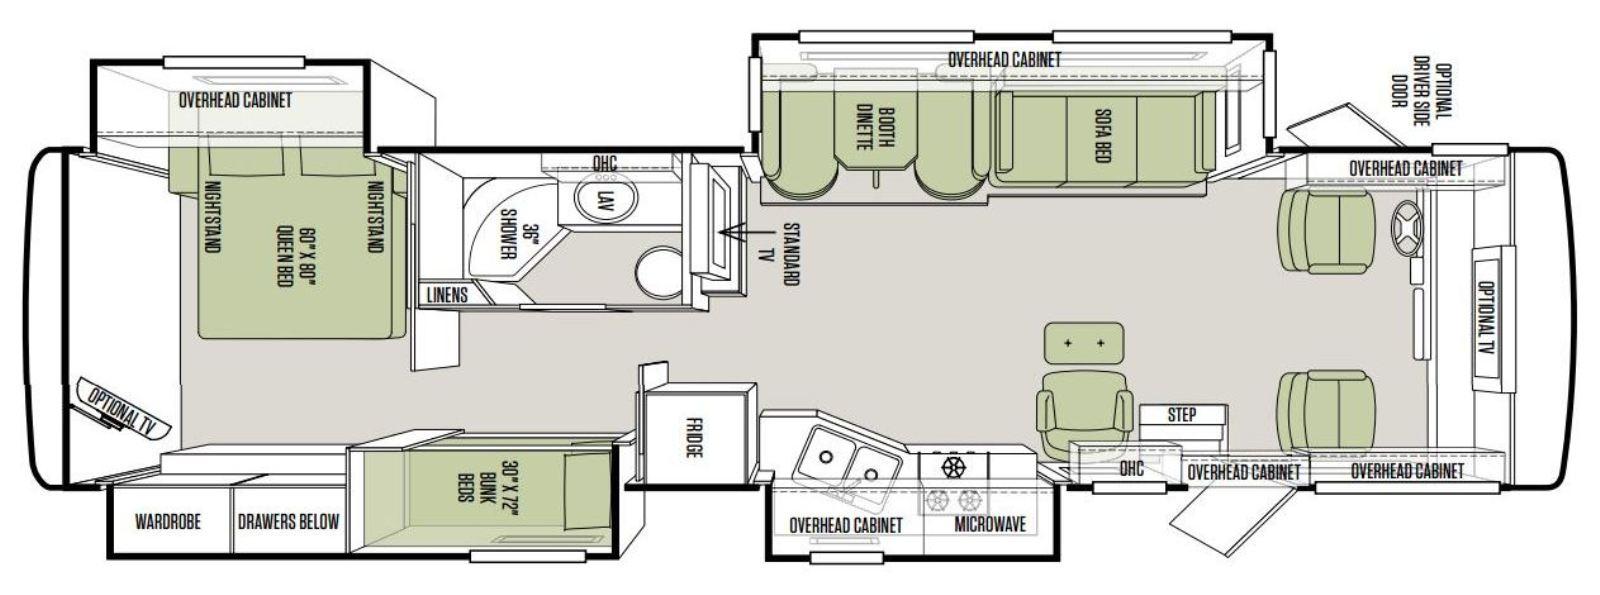 2013 Tiffin Allegro Open Road 35QBA Floorplan?resize\\\\\\\=665%2C247 23 hp vanguard wiring diagram 9 hp honda wiring diagram, onan 16 11Hp Vanguard at edmiracle.co